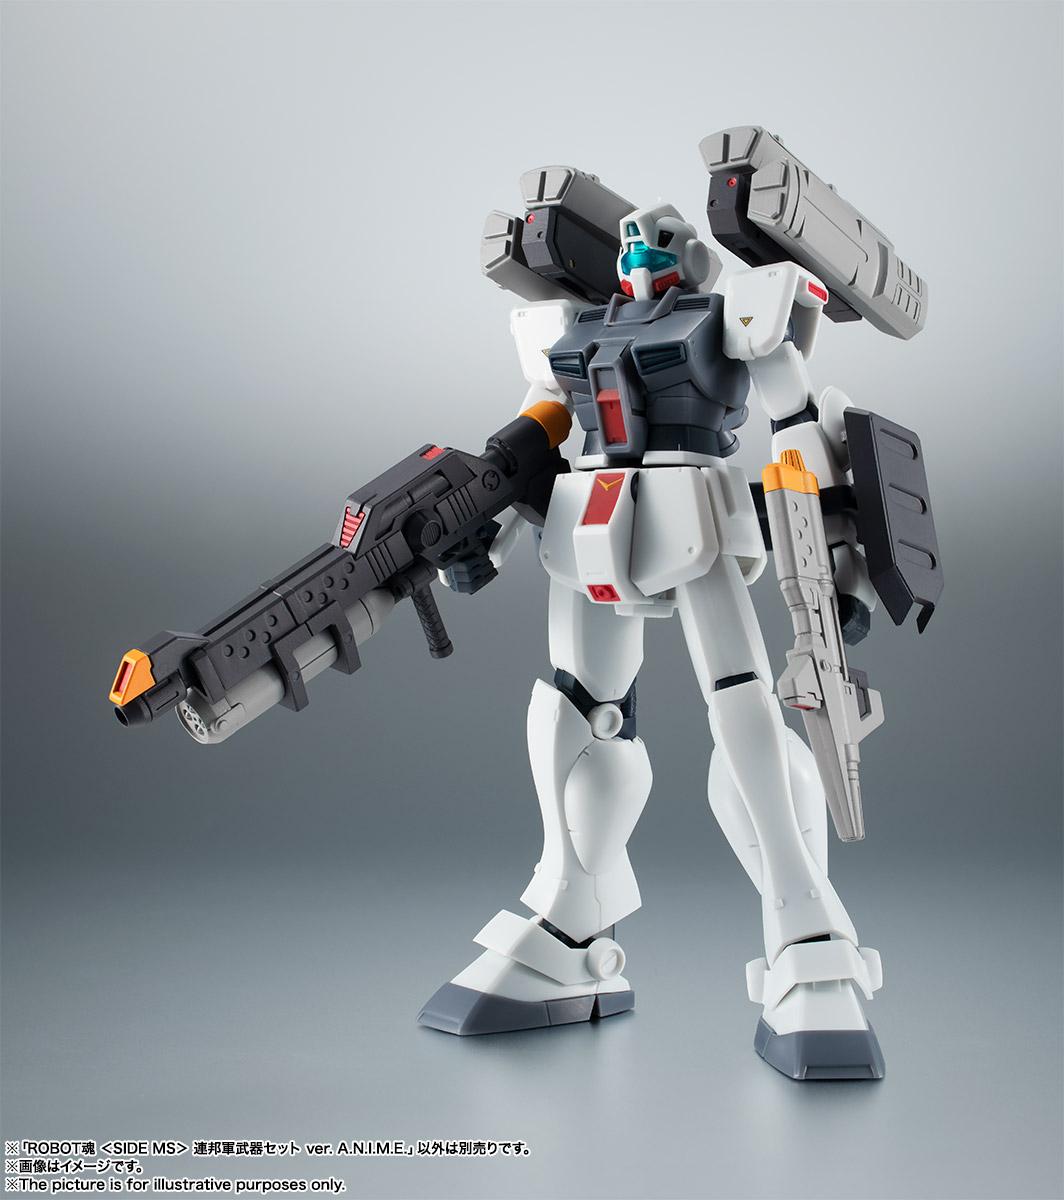 ROBOT魂〈SIDE MS〉『連邦軍武器セット ver. A.N.I.M.E.』ガンダム 完成品フィギュア-011